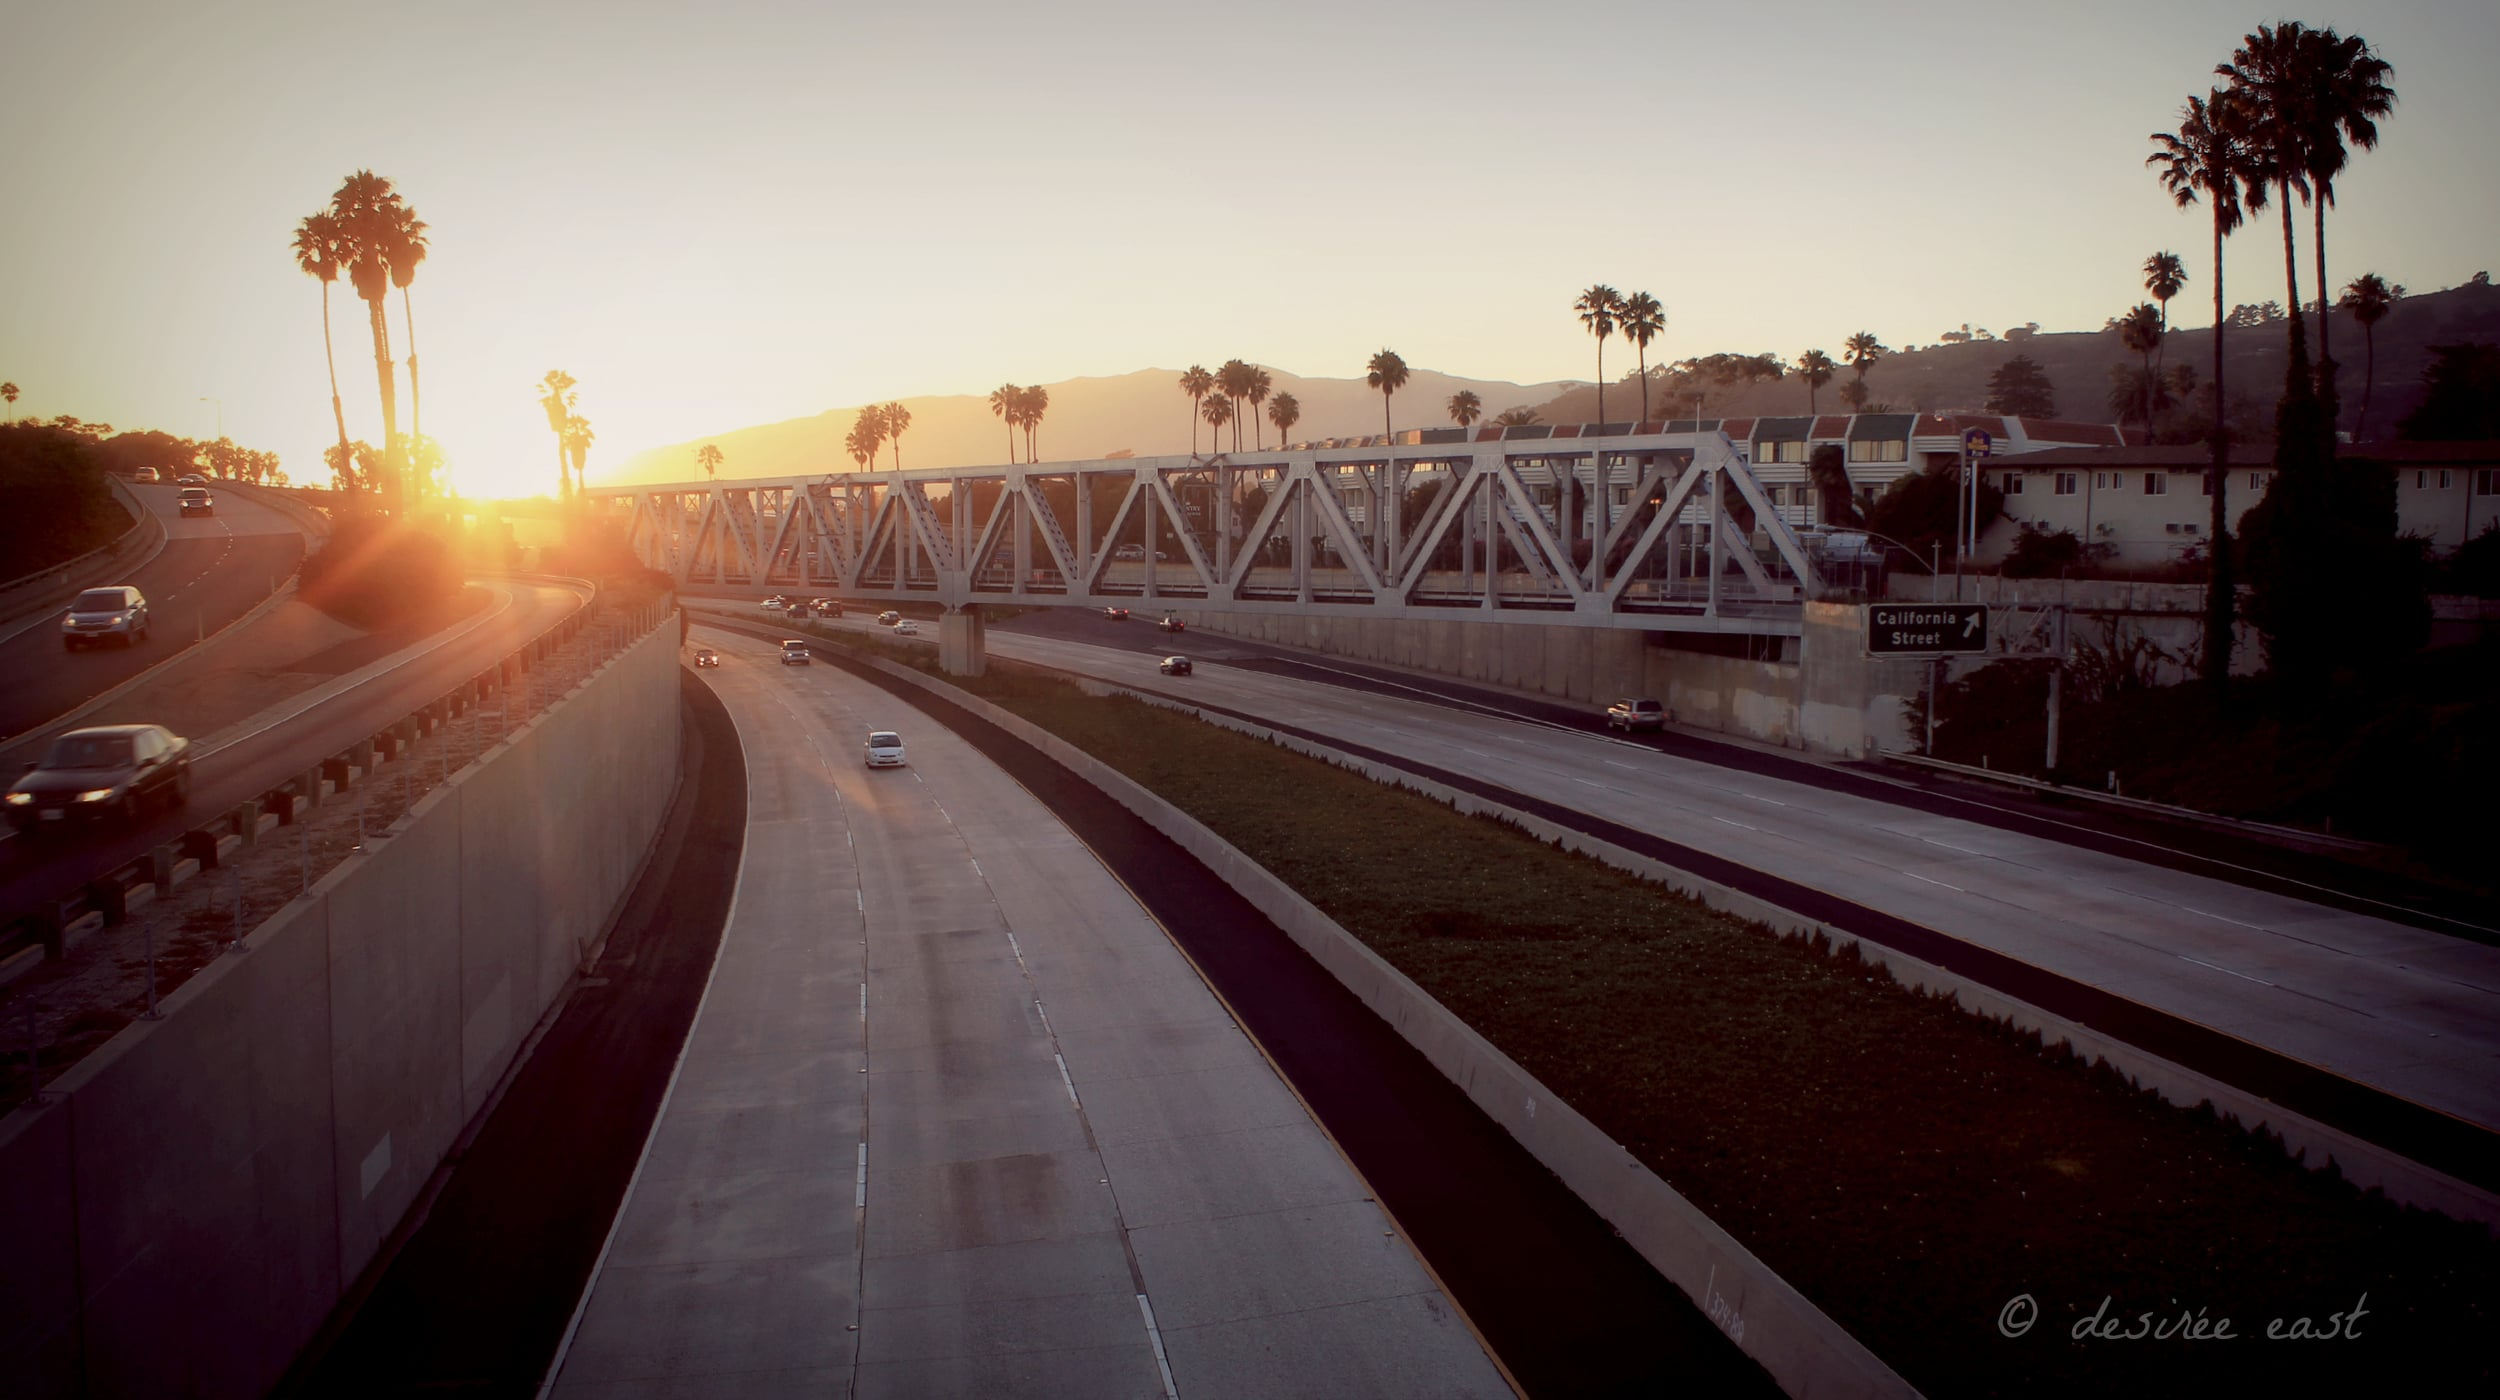 california street bridge train tracks. ventura, california. photo by desiree east